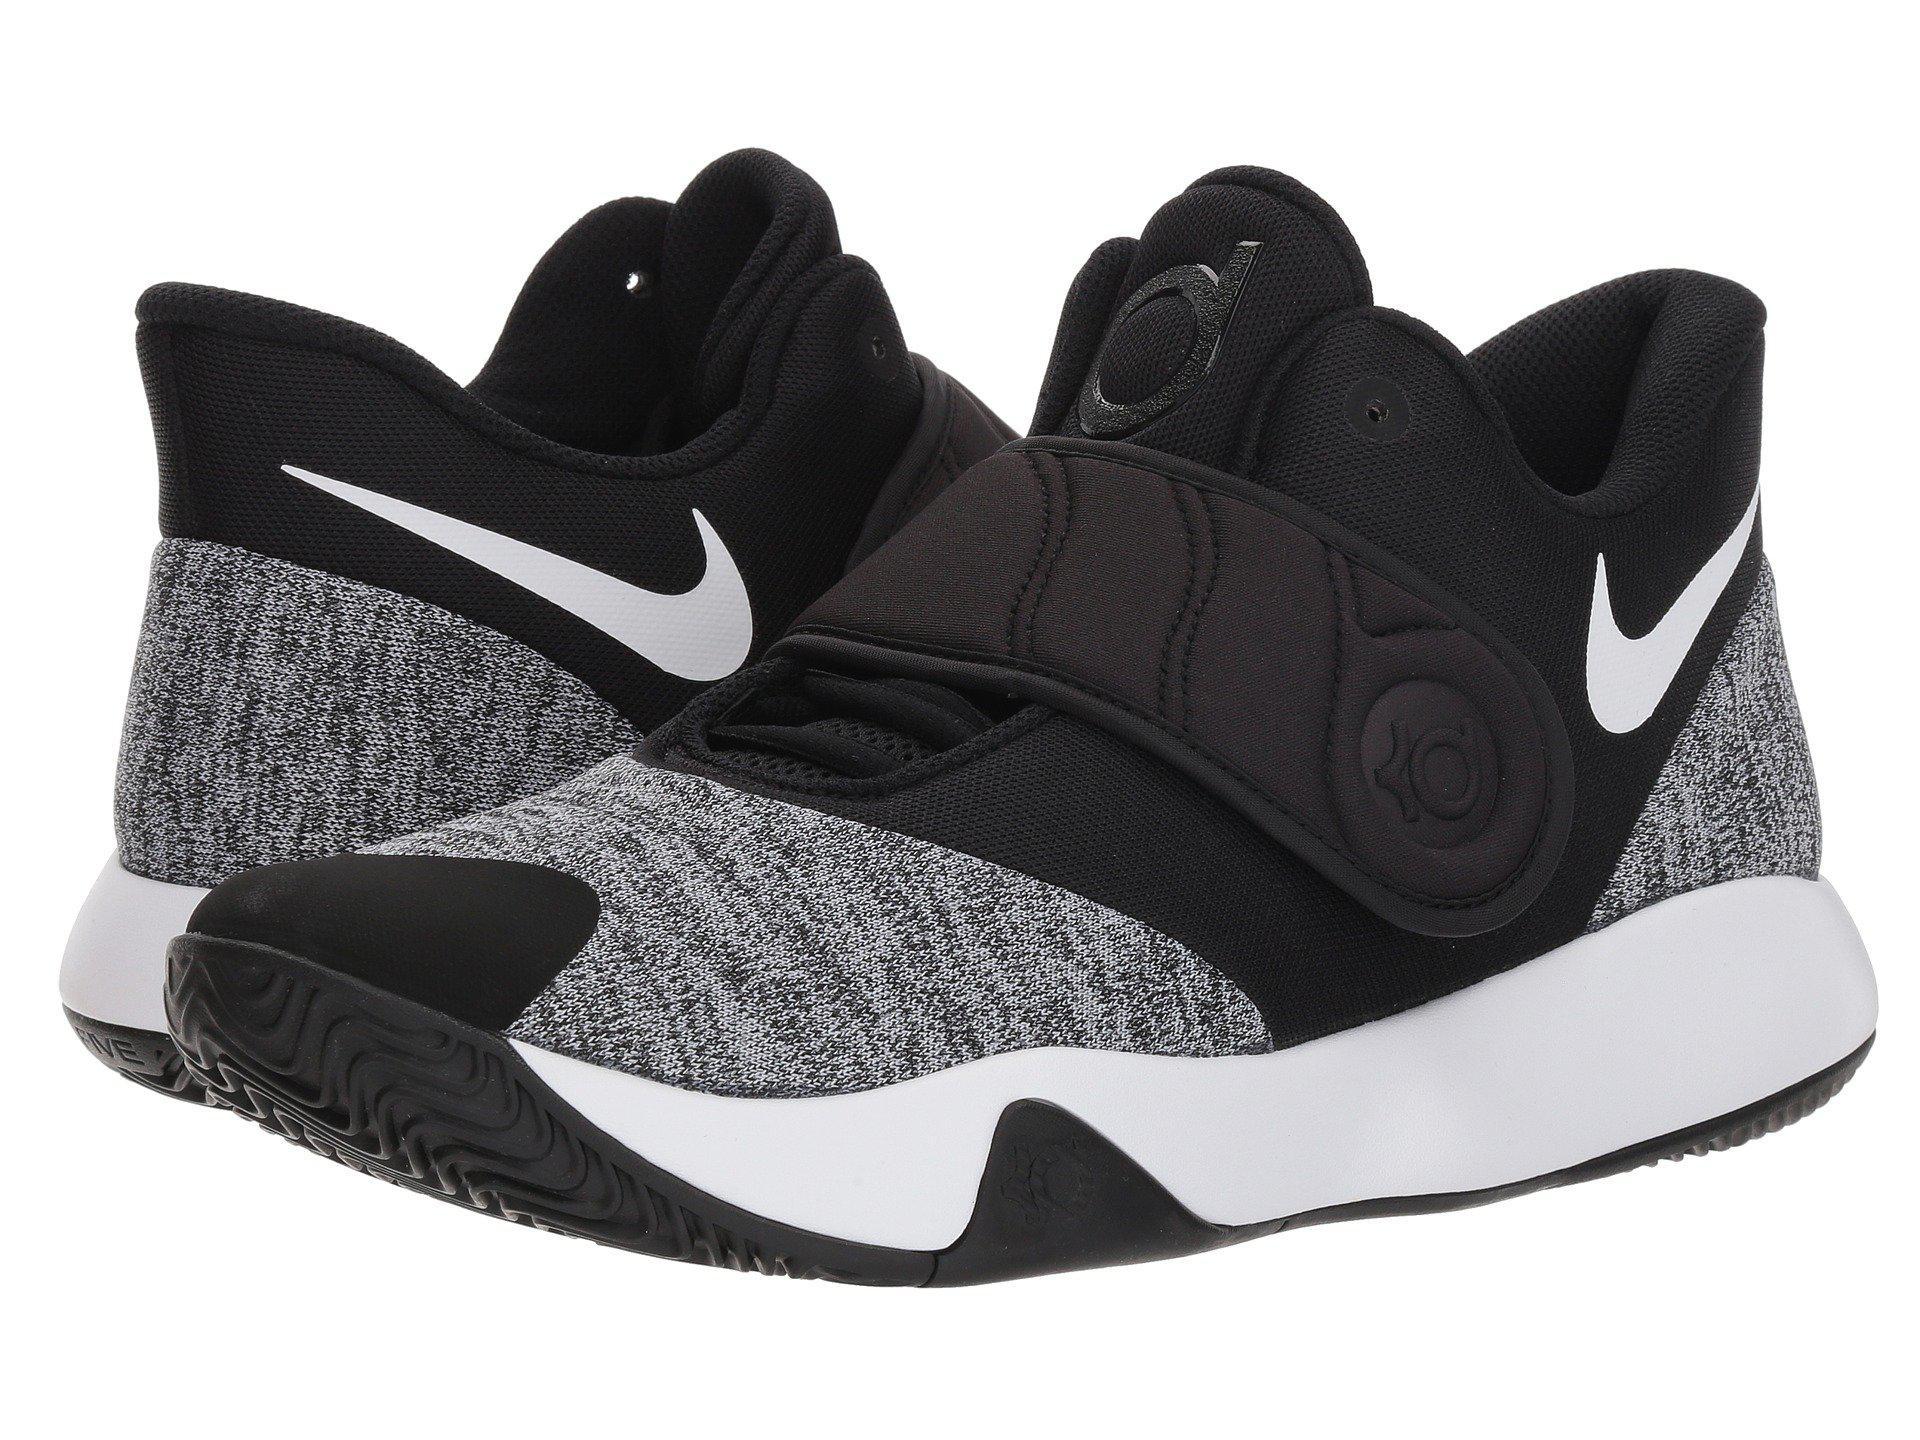 2c9885b9 Kd Trey 5 Vi (black/university Red/white) Men's Basketball Shoes